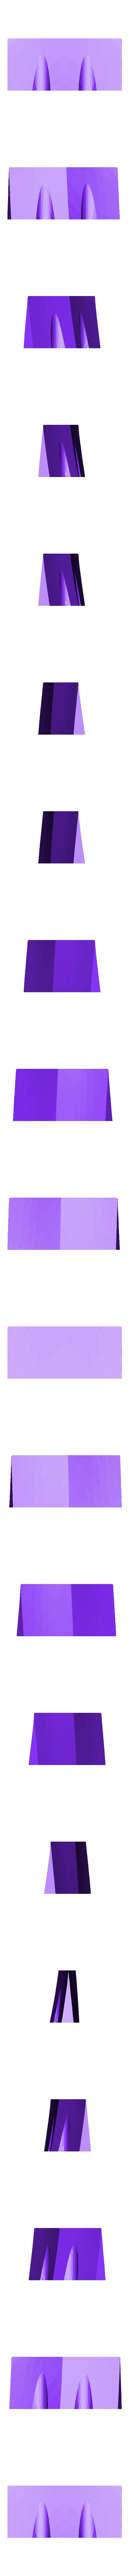 Fuse 4.obj Download free OBJ file Small Static Horten 229 • 3D printable object, francoispeyper